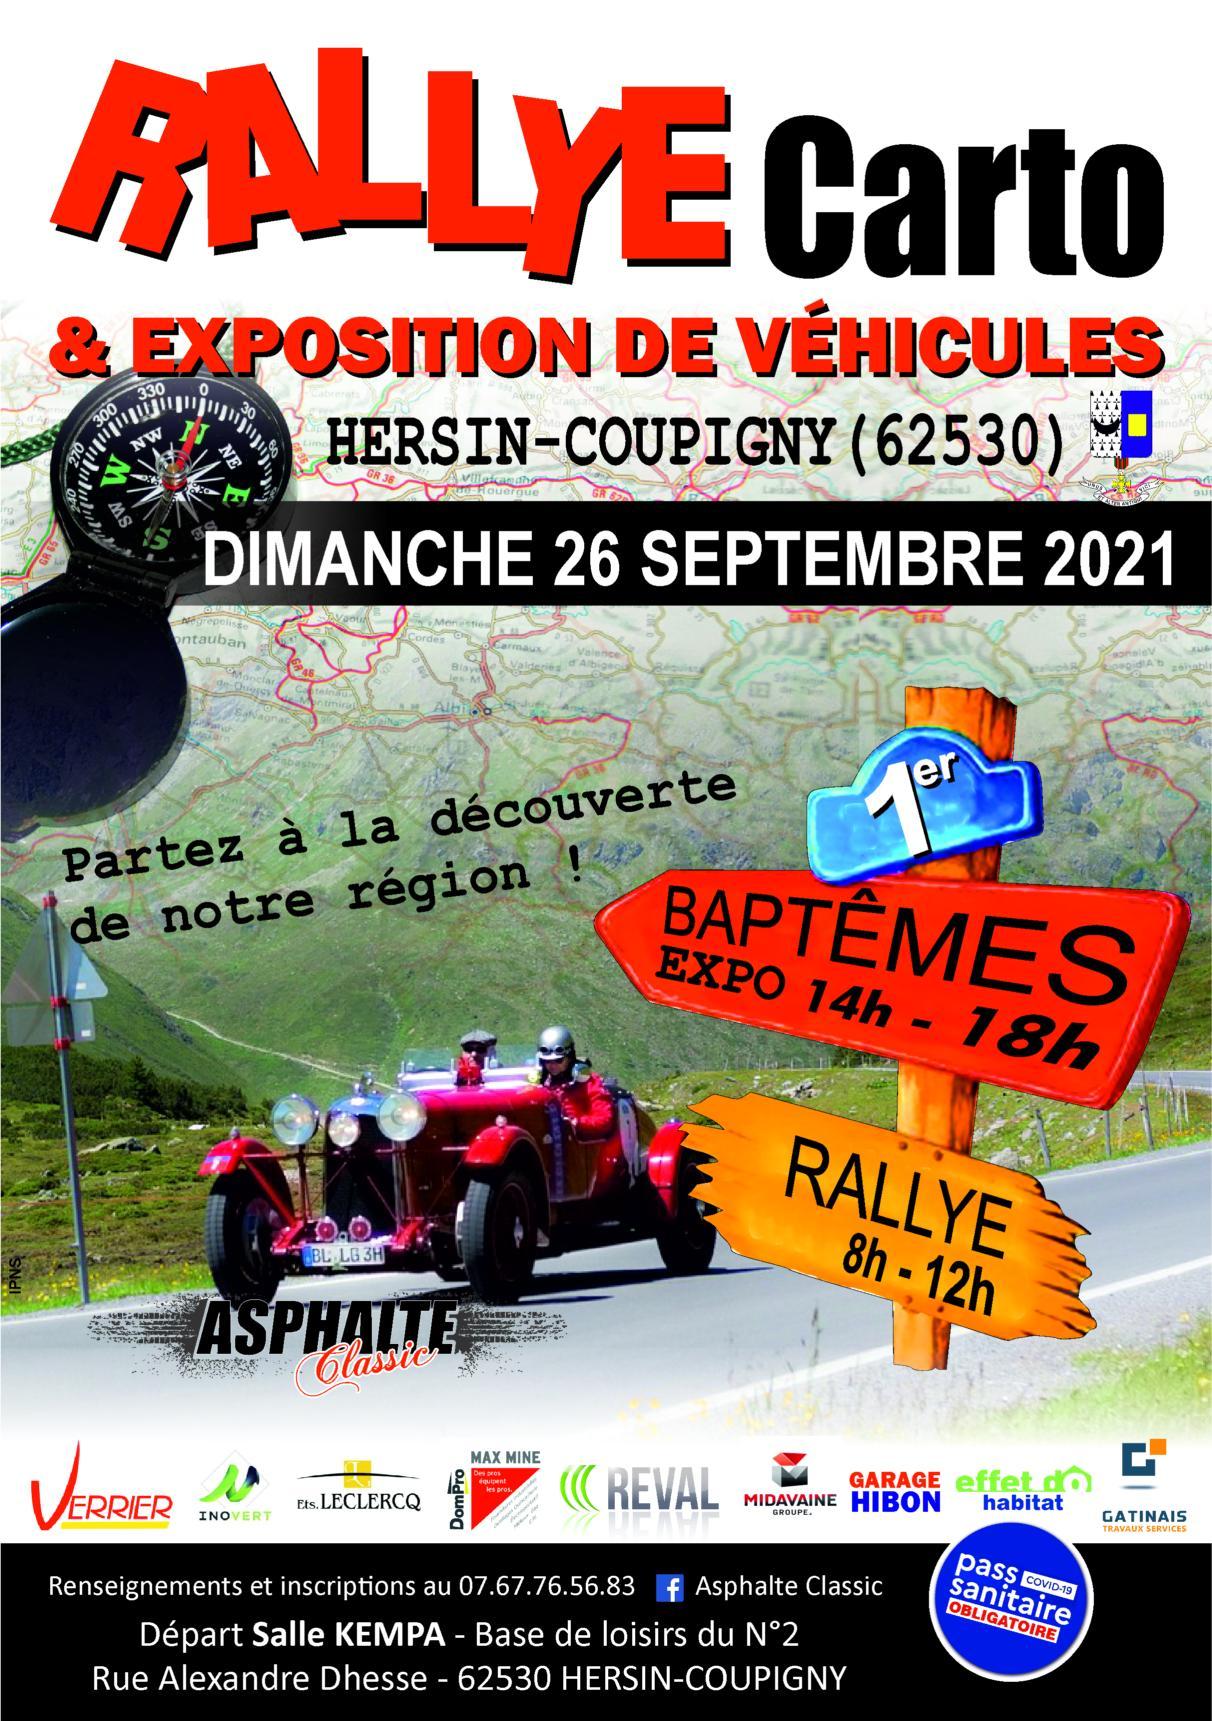 Rallye carto @ Salle Kempa | Hersin-Coupigny | Hauts-de-France | France